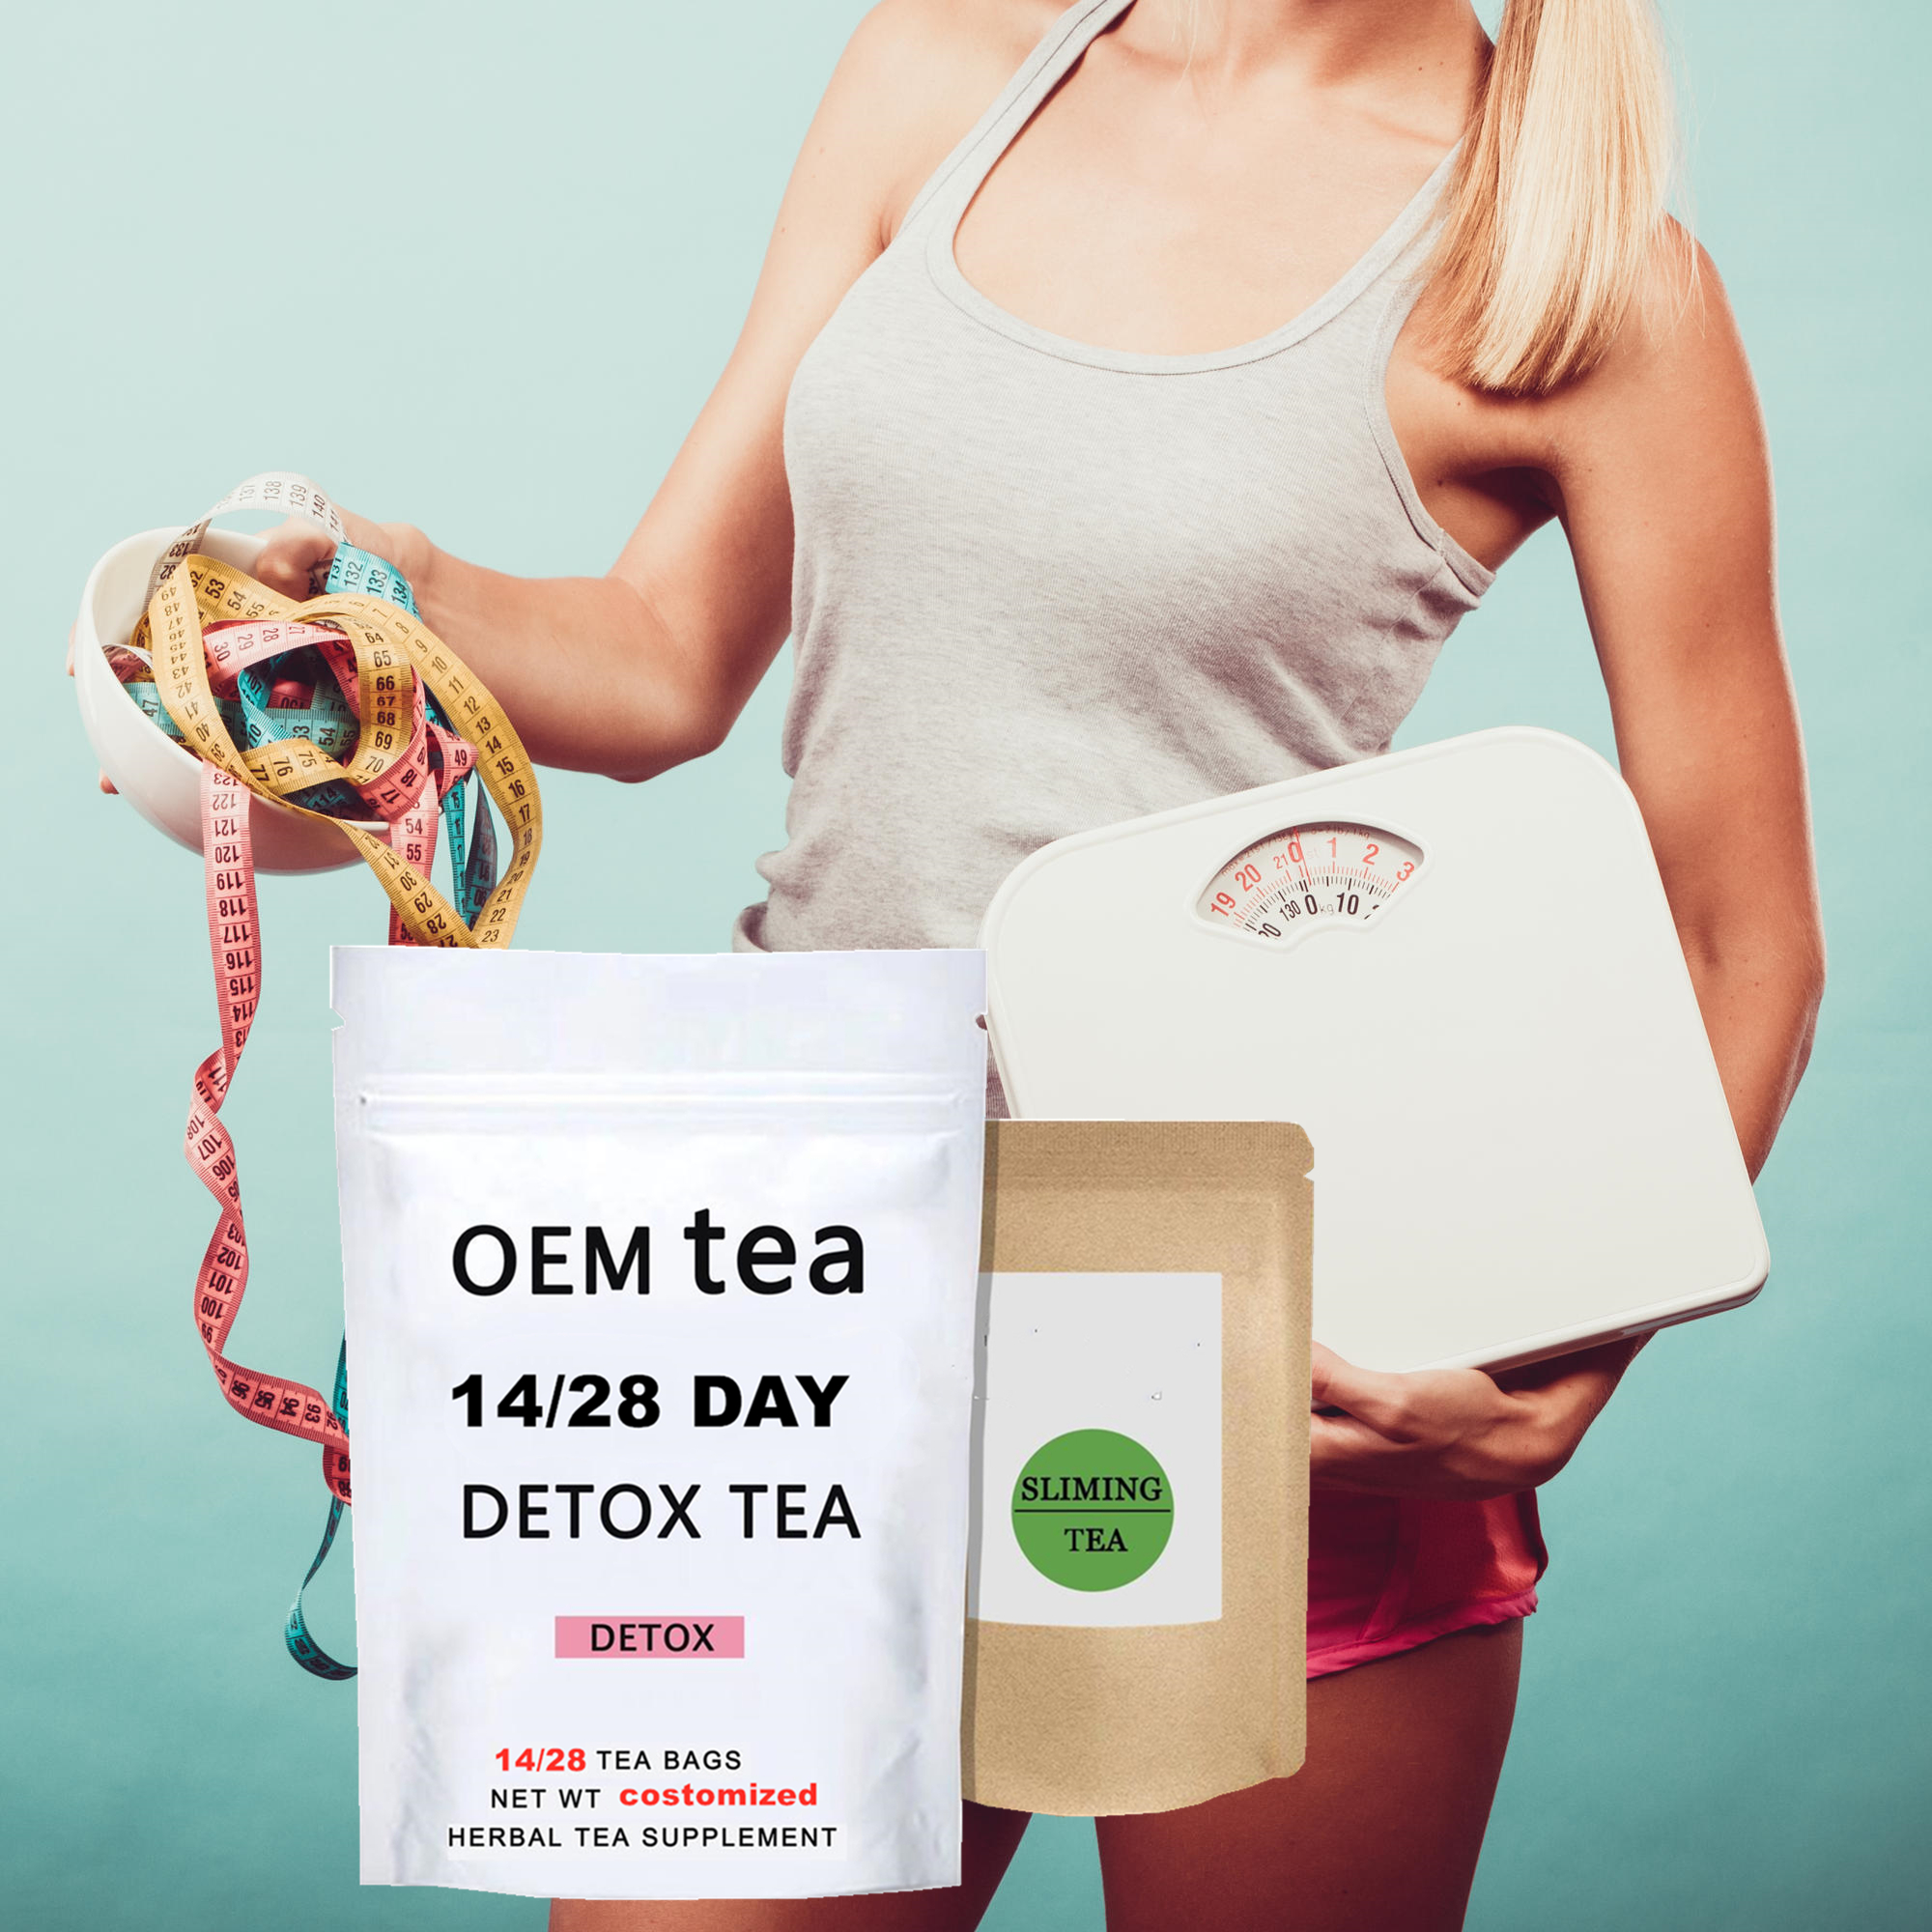 Best Selling Slimming Detox Tea weight loss 14 days 28 days OEM skinny detox tea flat tummy tea - 4uTea | 4uTea.com